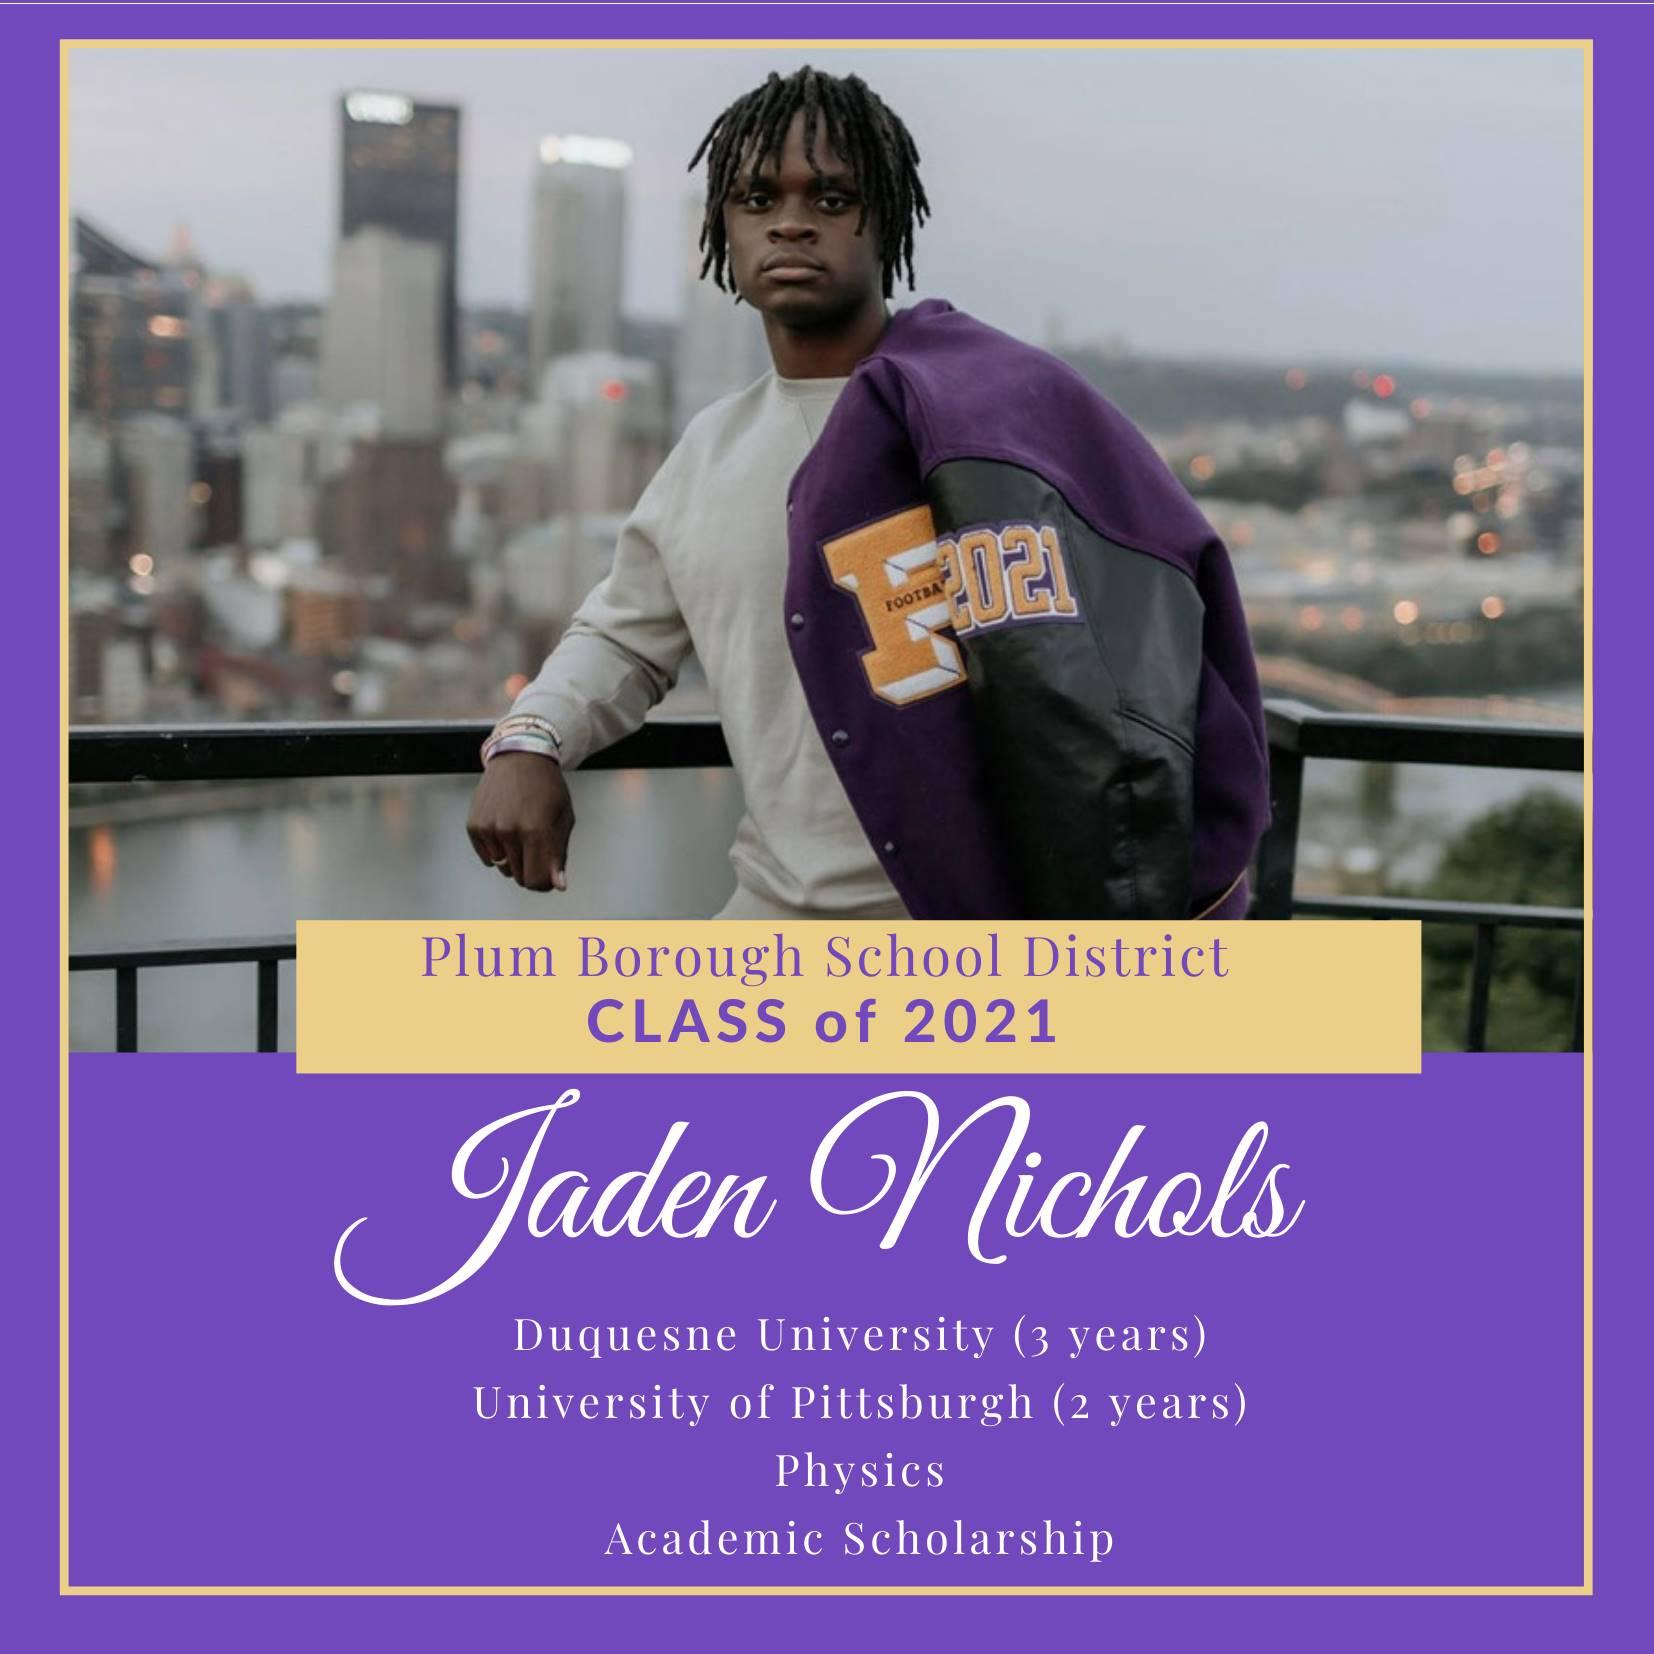 Congratulations to Jaden Nichols, Class of 2021!